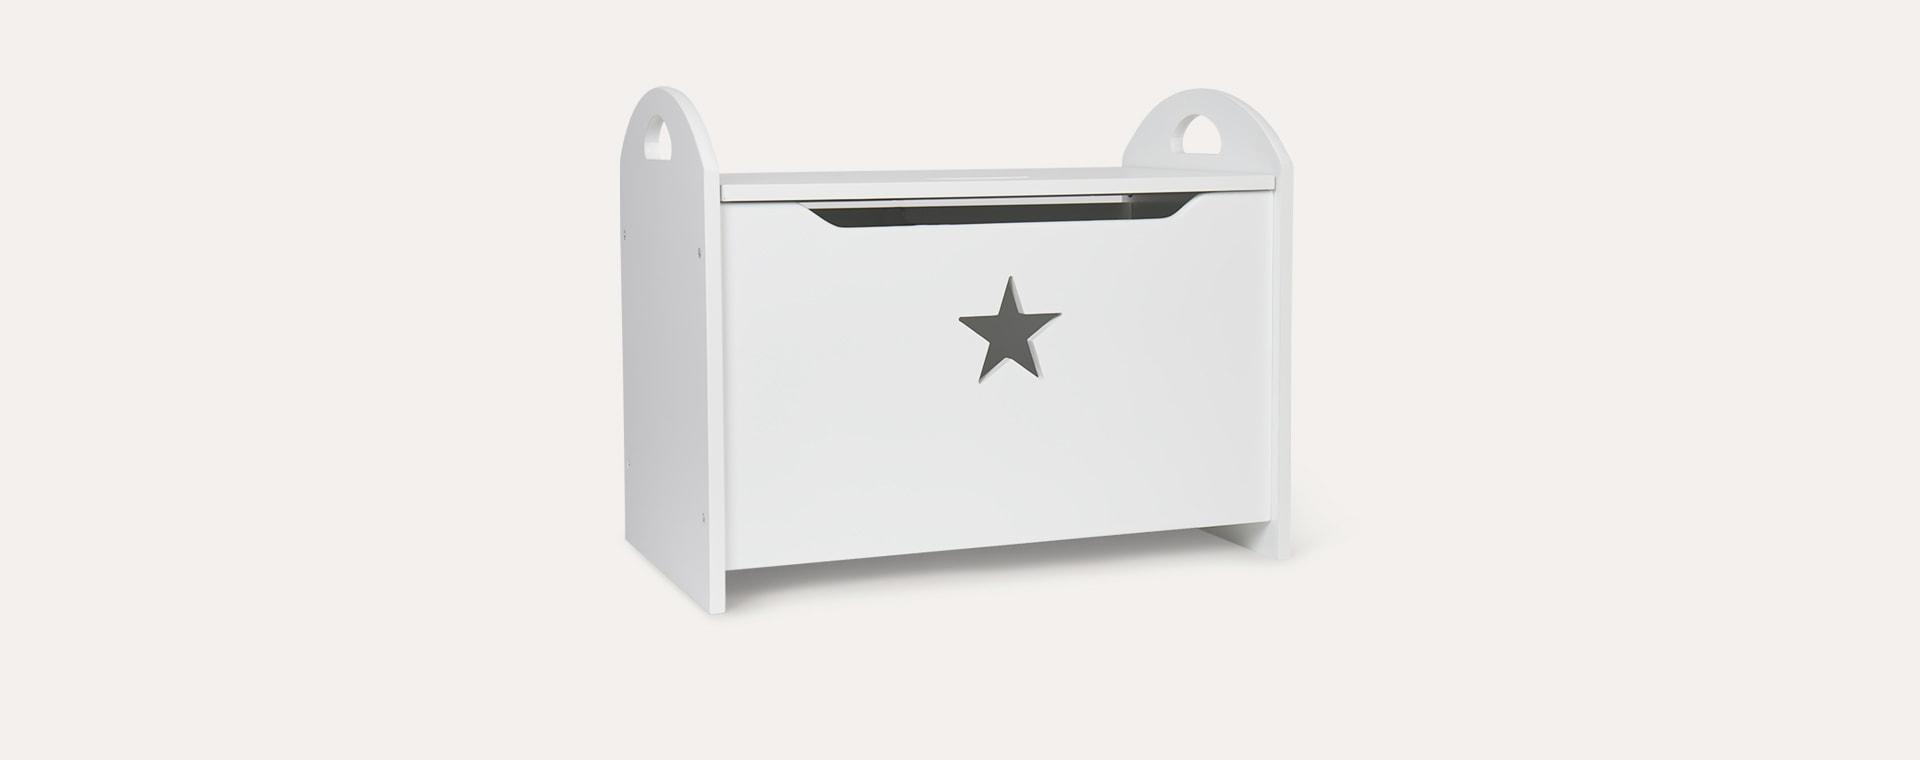 White Kid's Concept Star Toy Chest